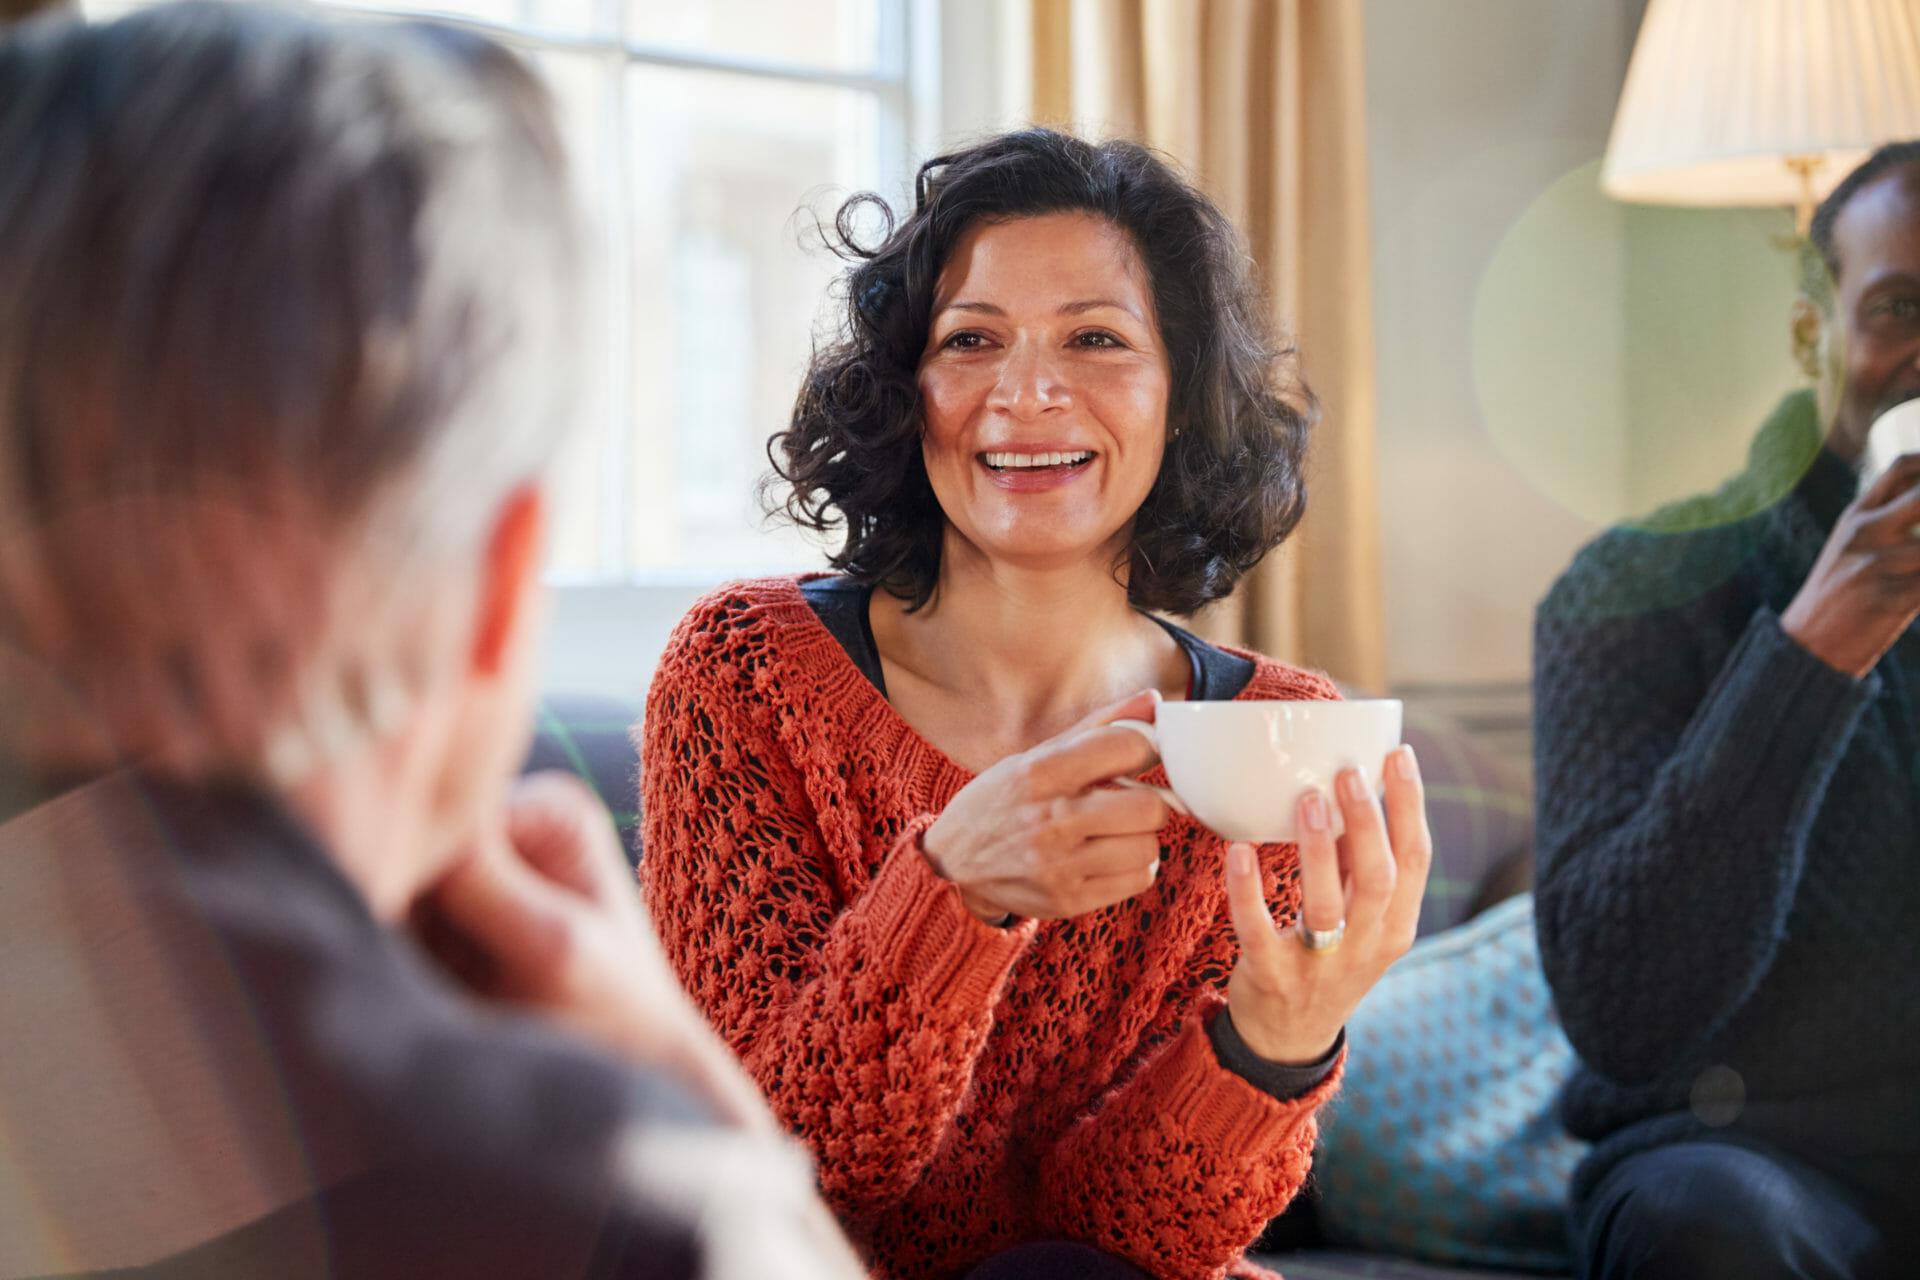 Woman holding a mug smiling